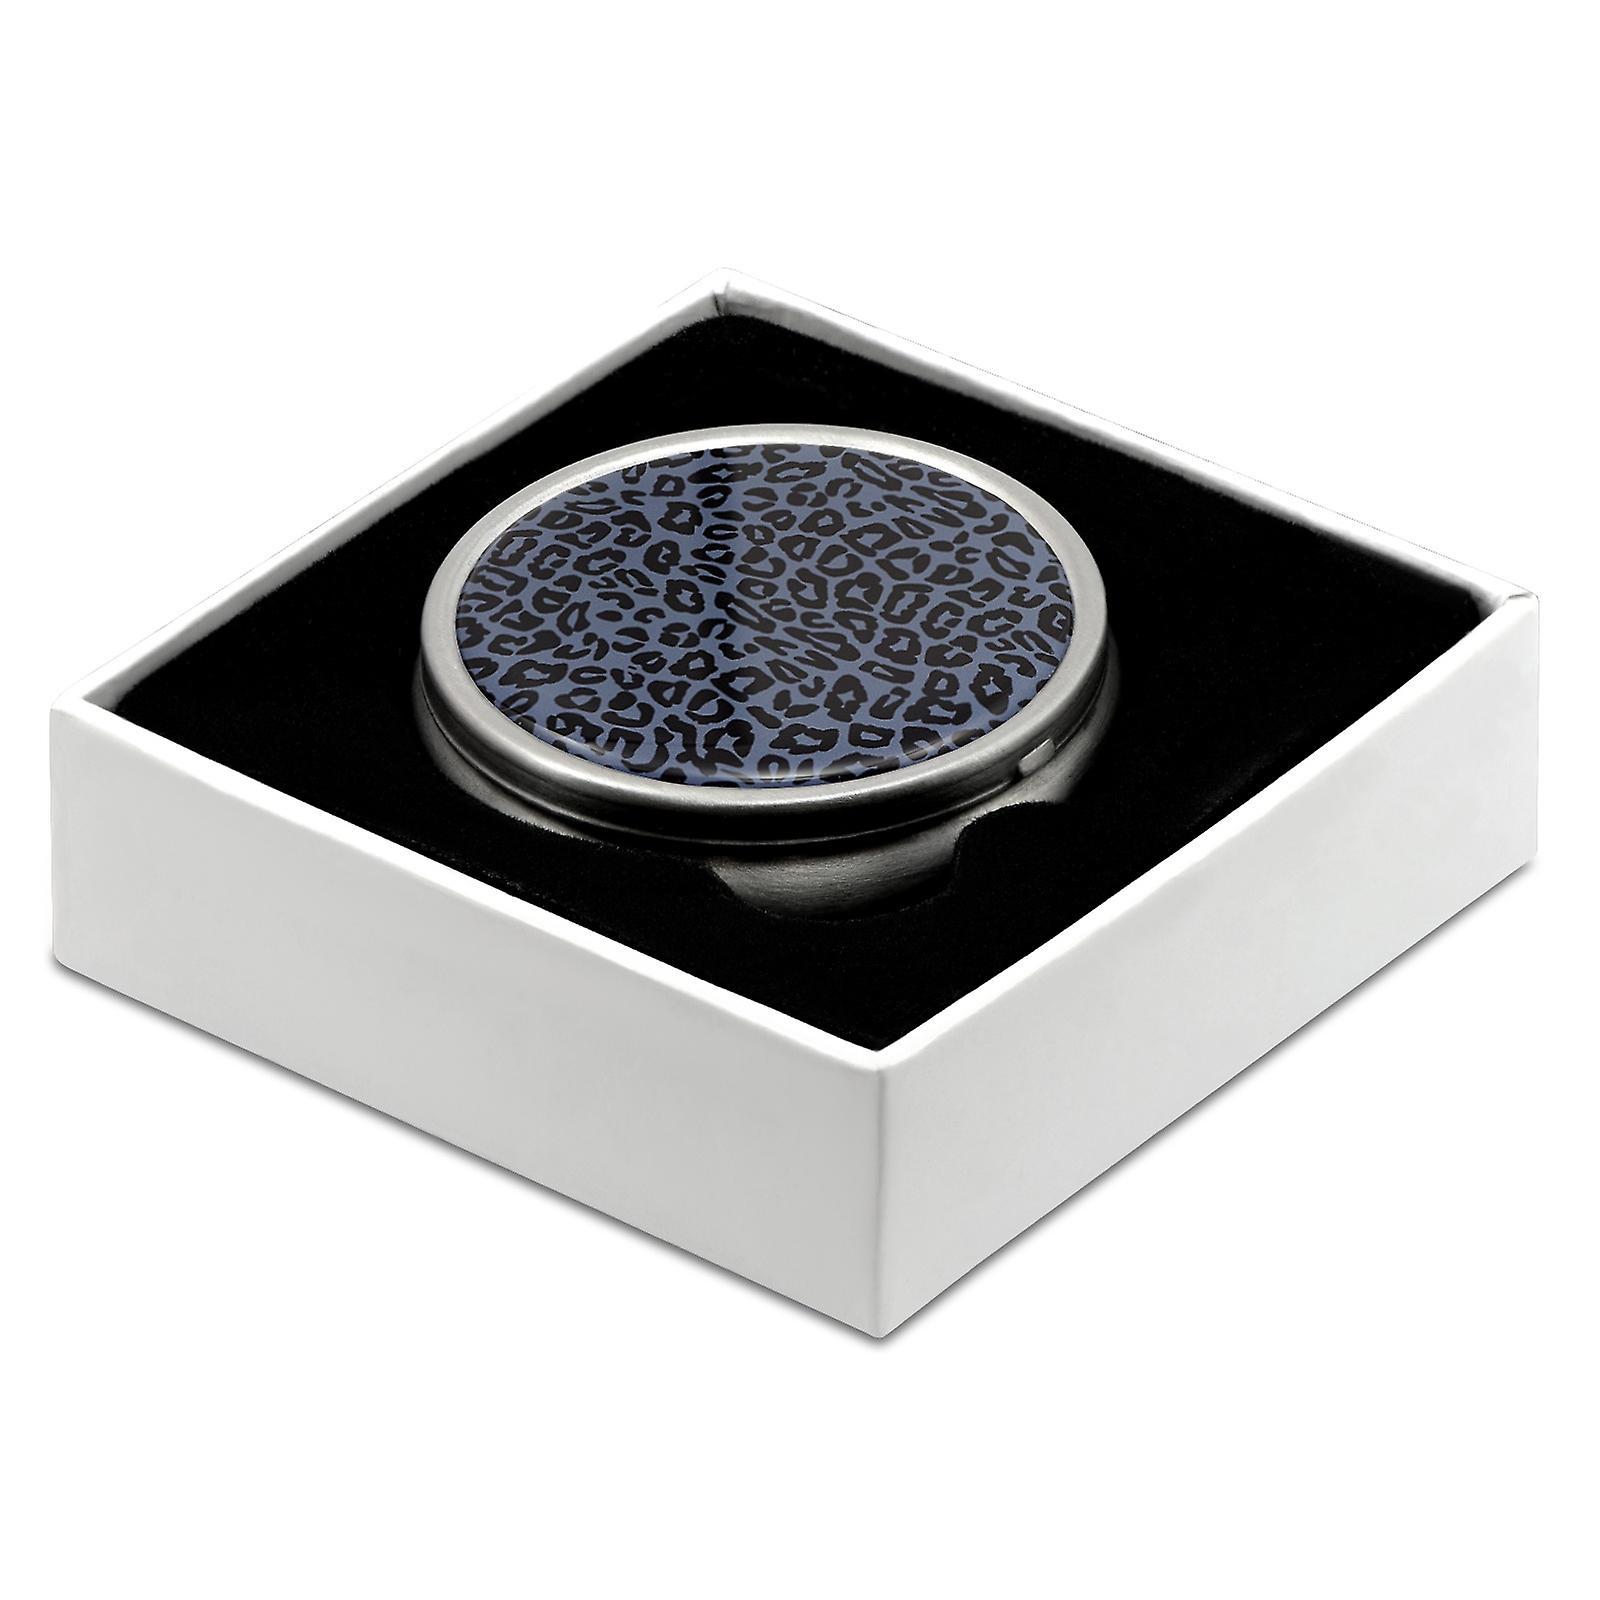 Pill Box with Leopard Print